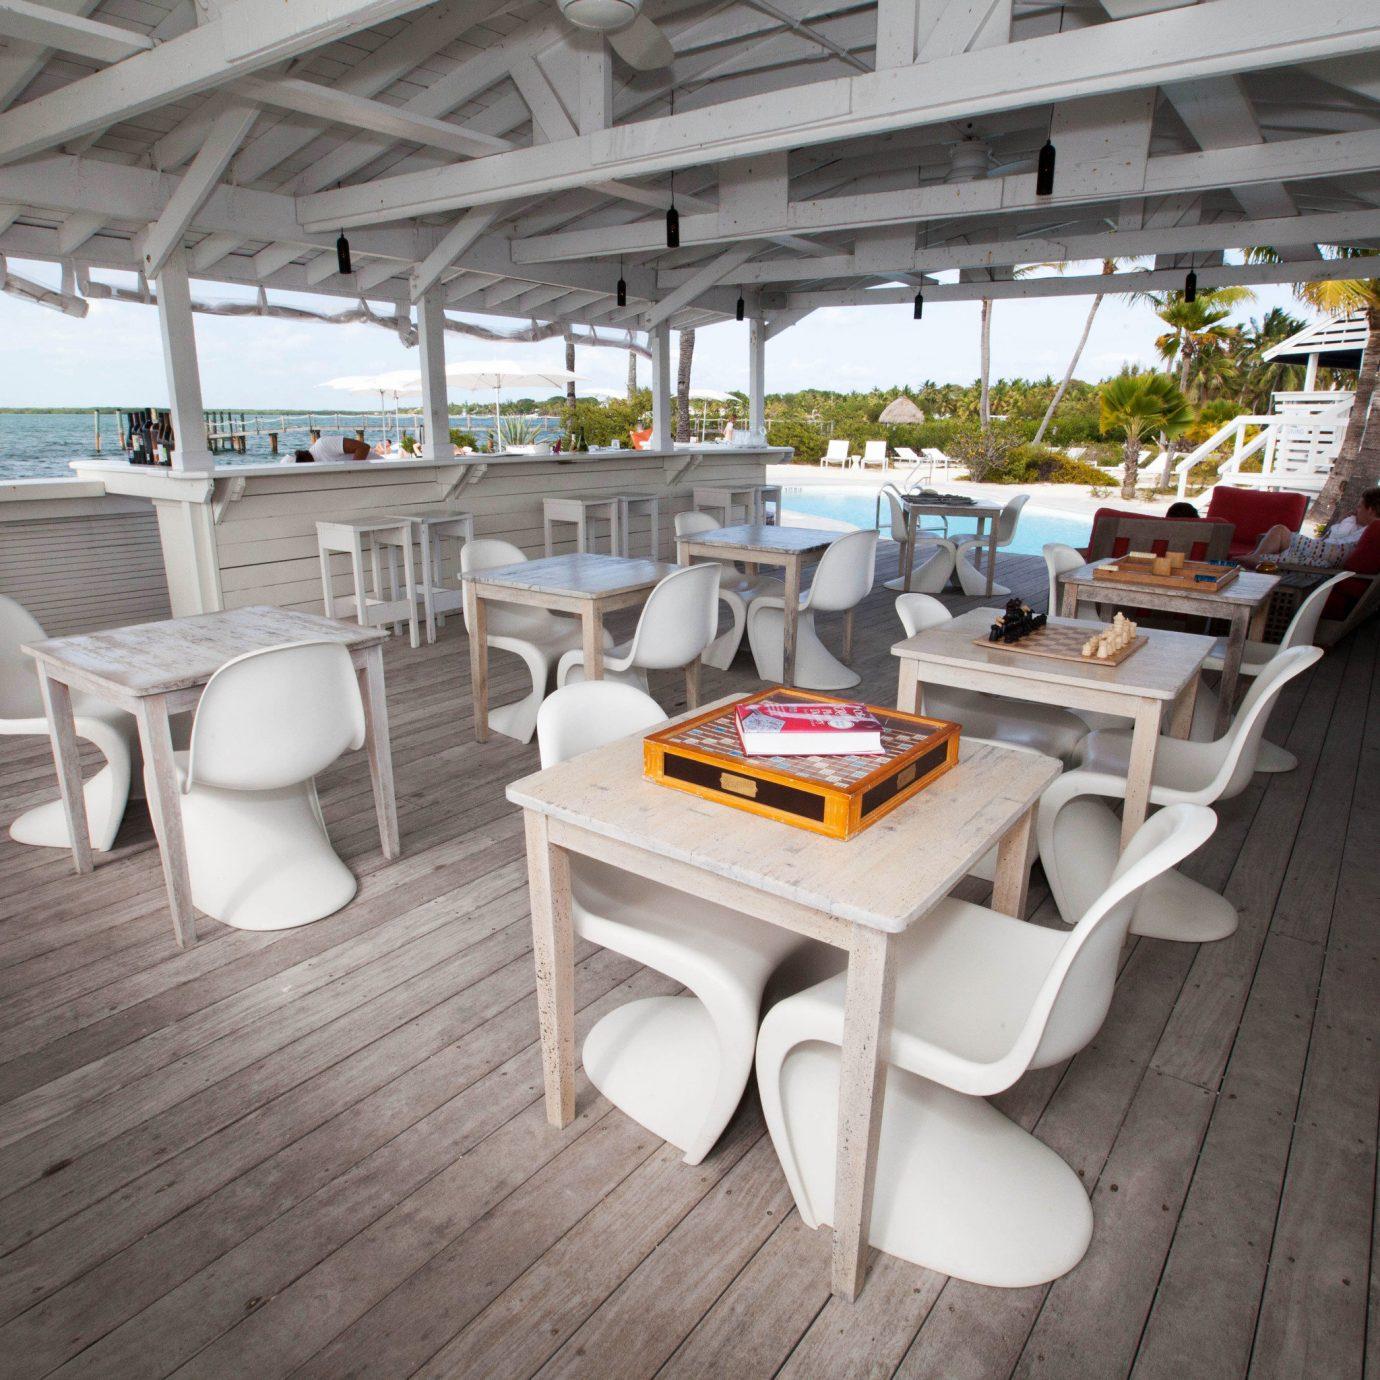 Boat chair vehicle yacht passenger ship watercraft restaurant ship Resort Deck